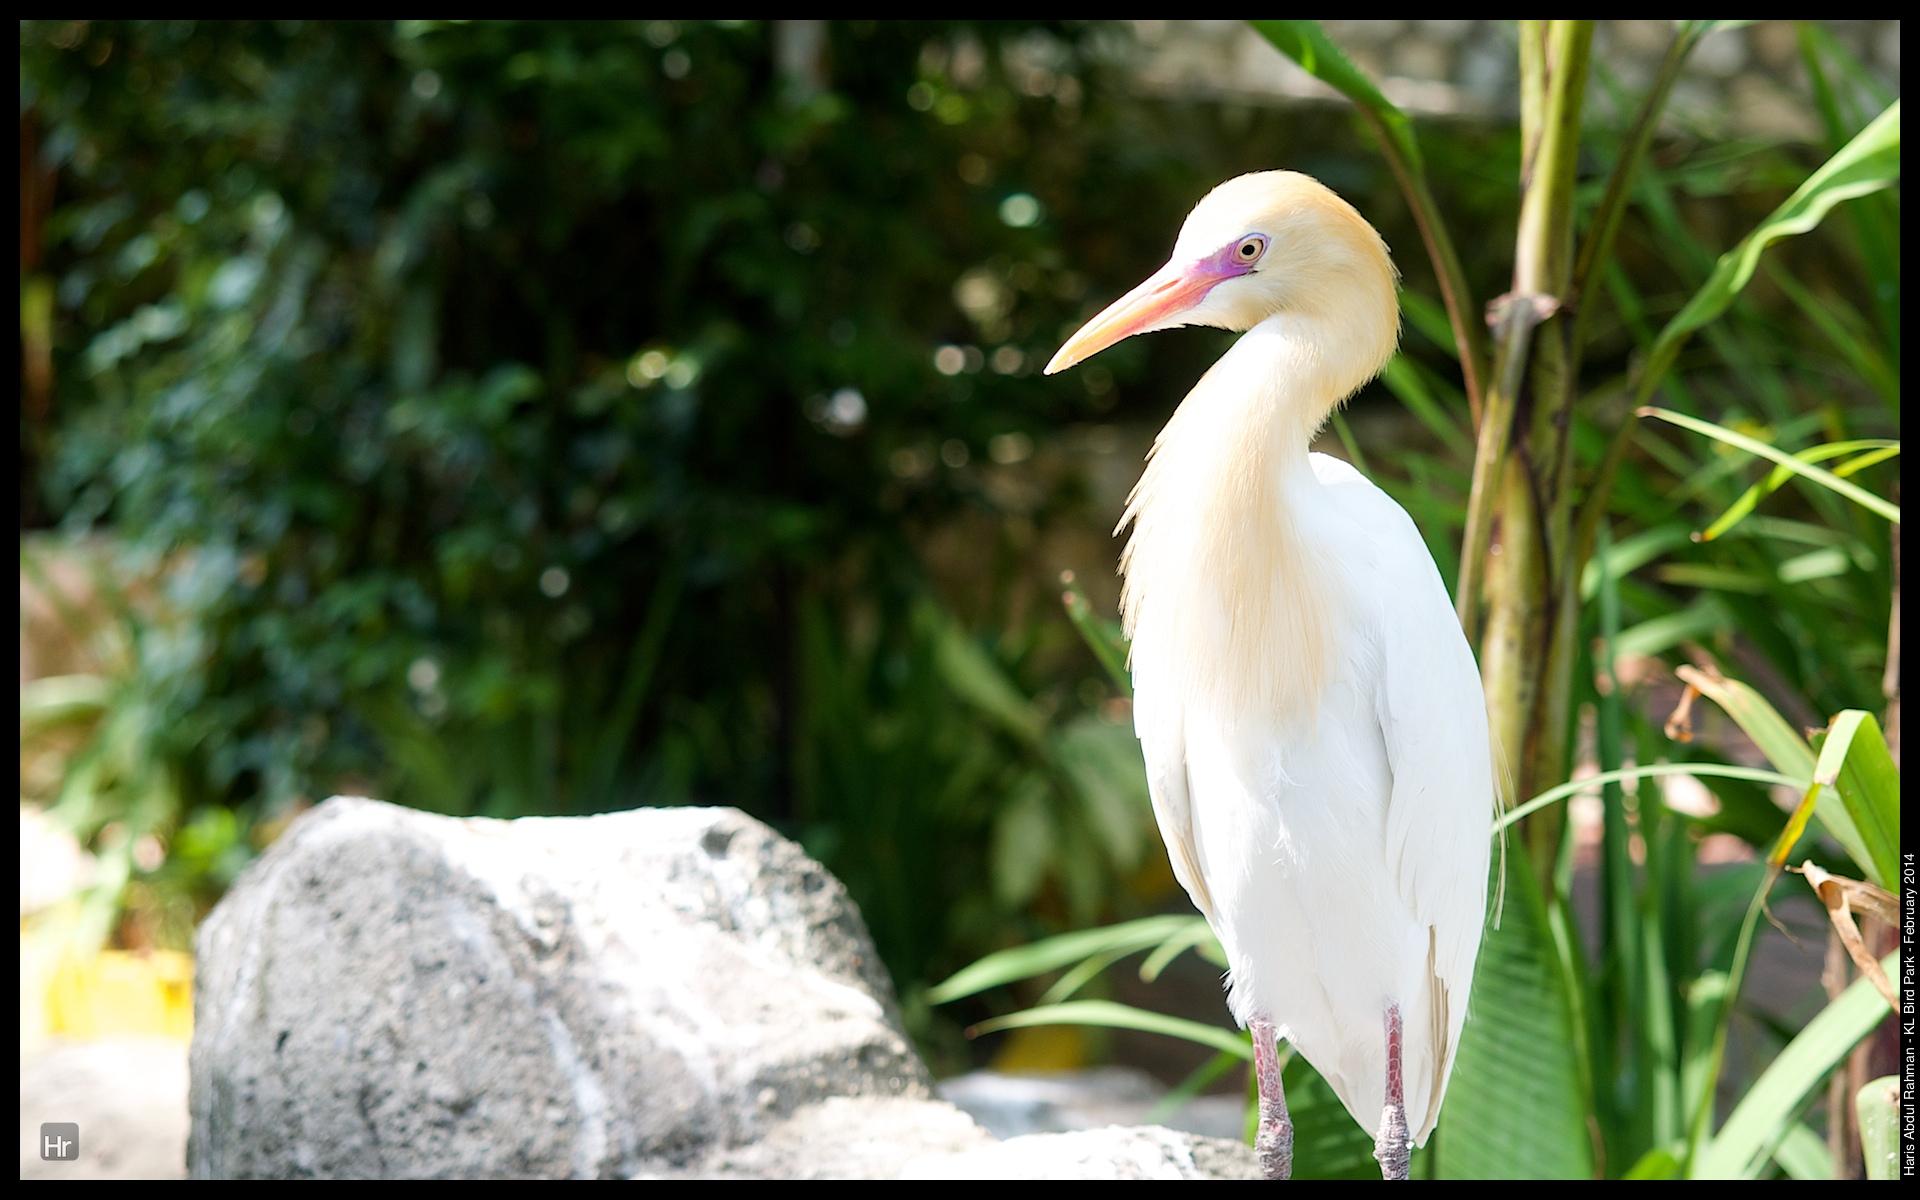 140223 KL Bird Park 1.jpg